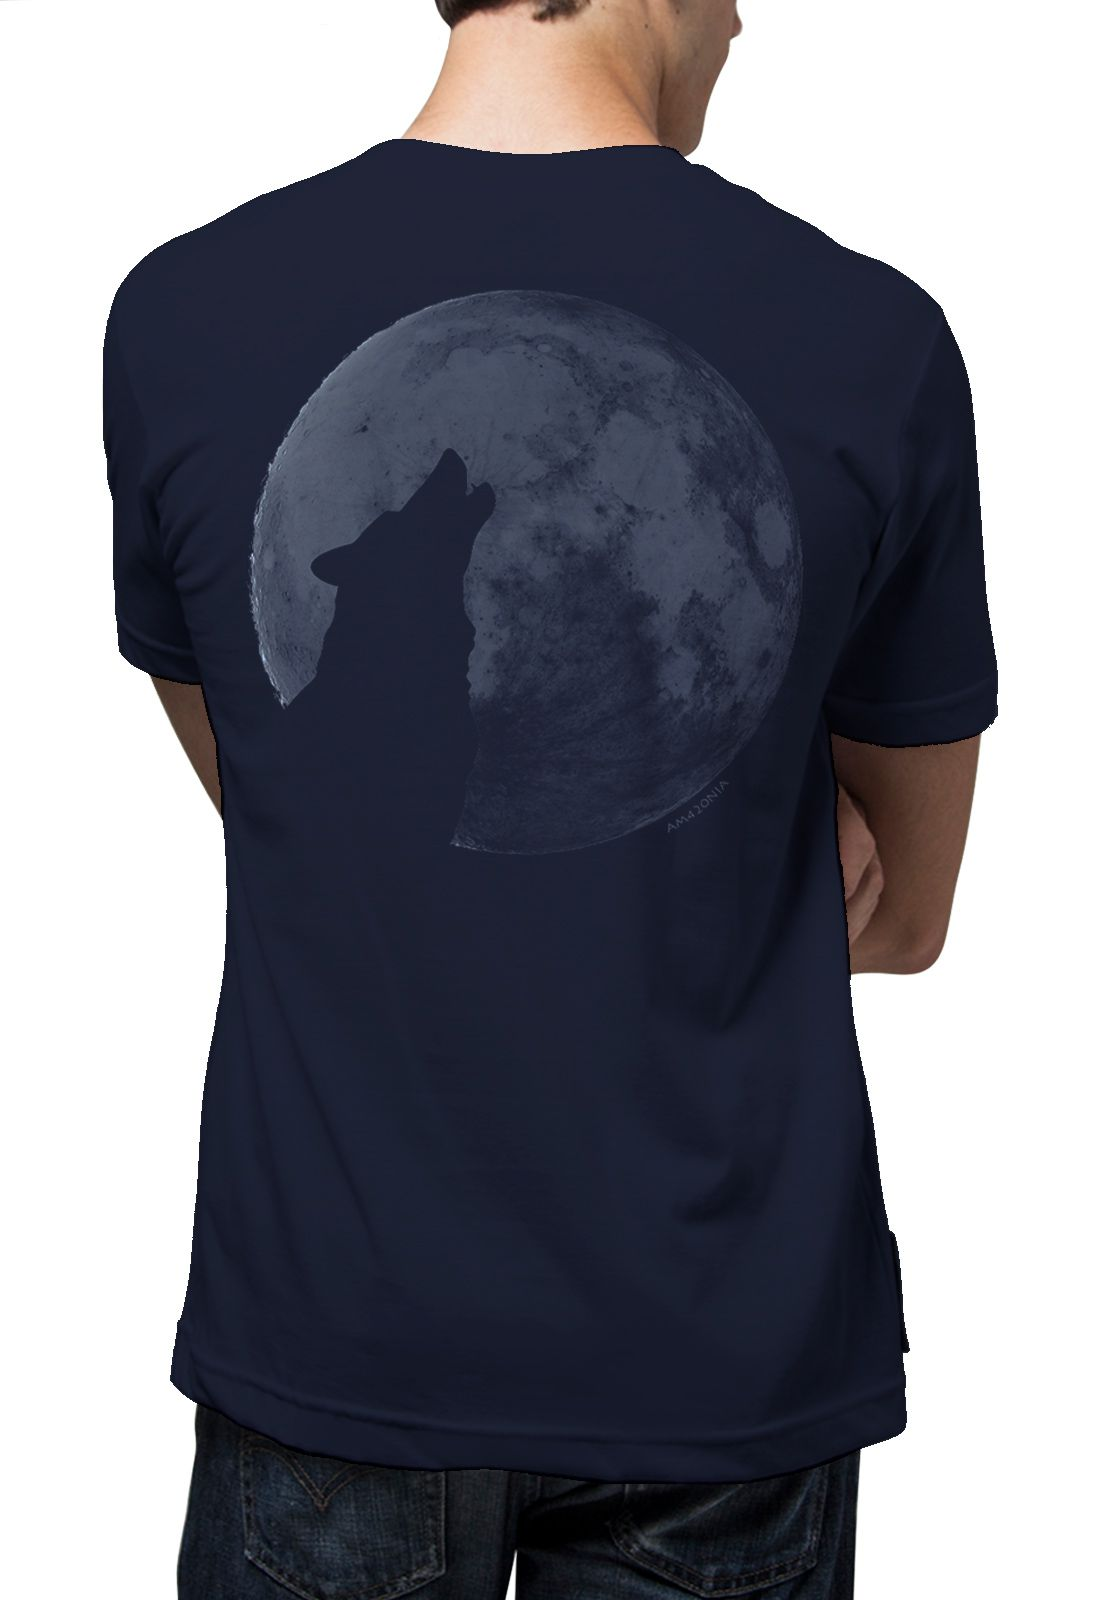 Camiseta Amazônia Lua Cheia - Azul Escuro